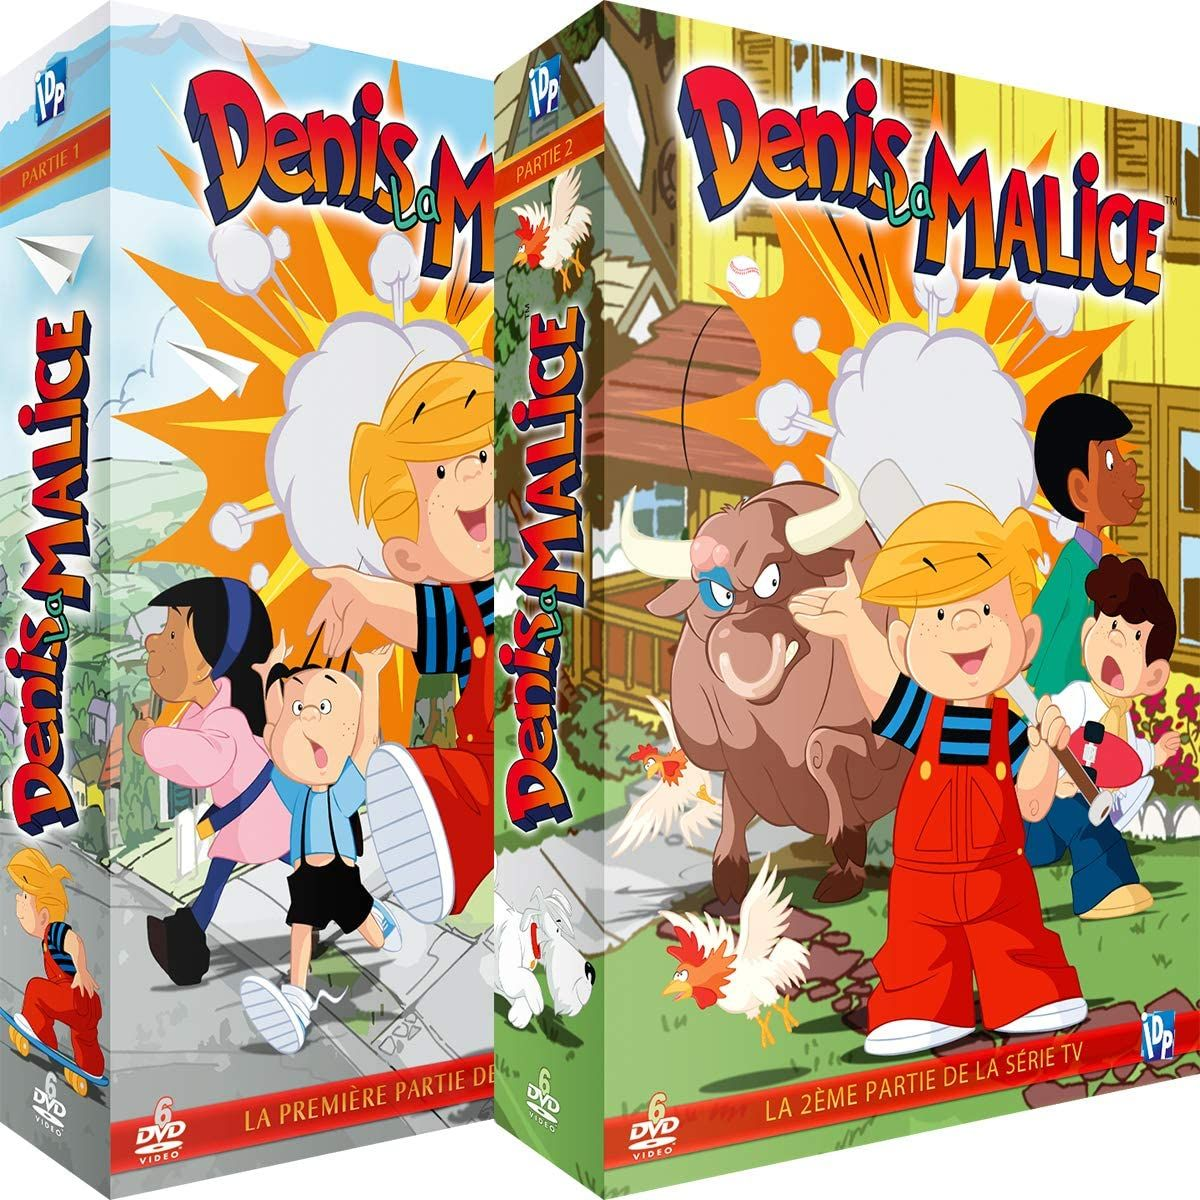 Denis La Malice Integrale De La Serie Tv 2 Coffrets 12 Dvd Comme Des Garcons Dessin Anime Anime